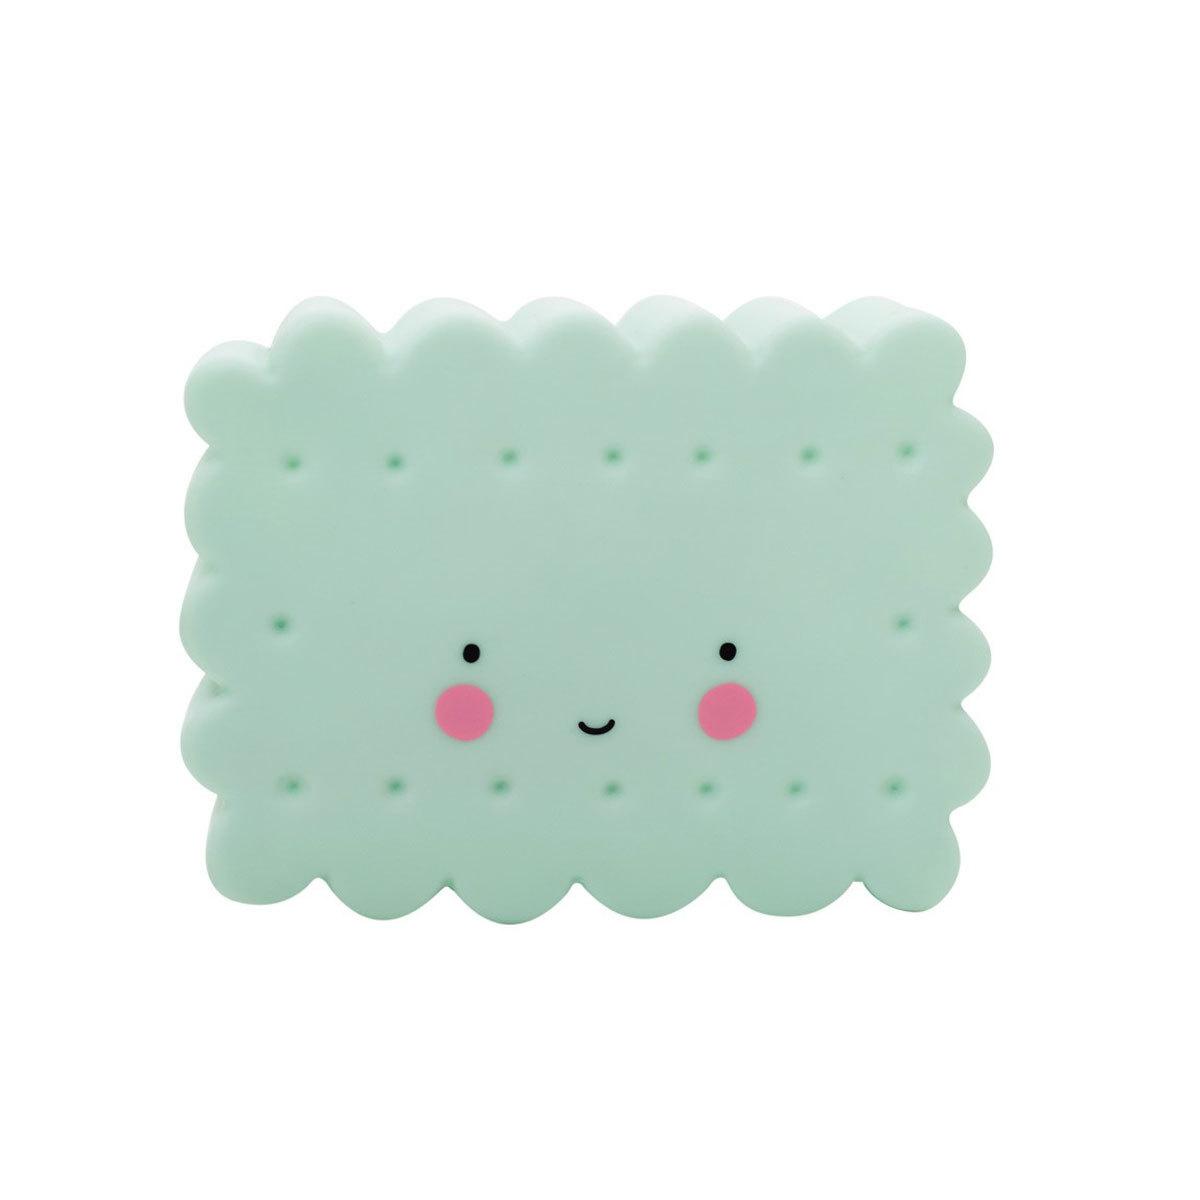 Veilleuse Mini Veilleuse LED Cookie - Menthe Mini Veilleuse LED Cookie - Menthe